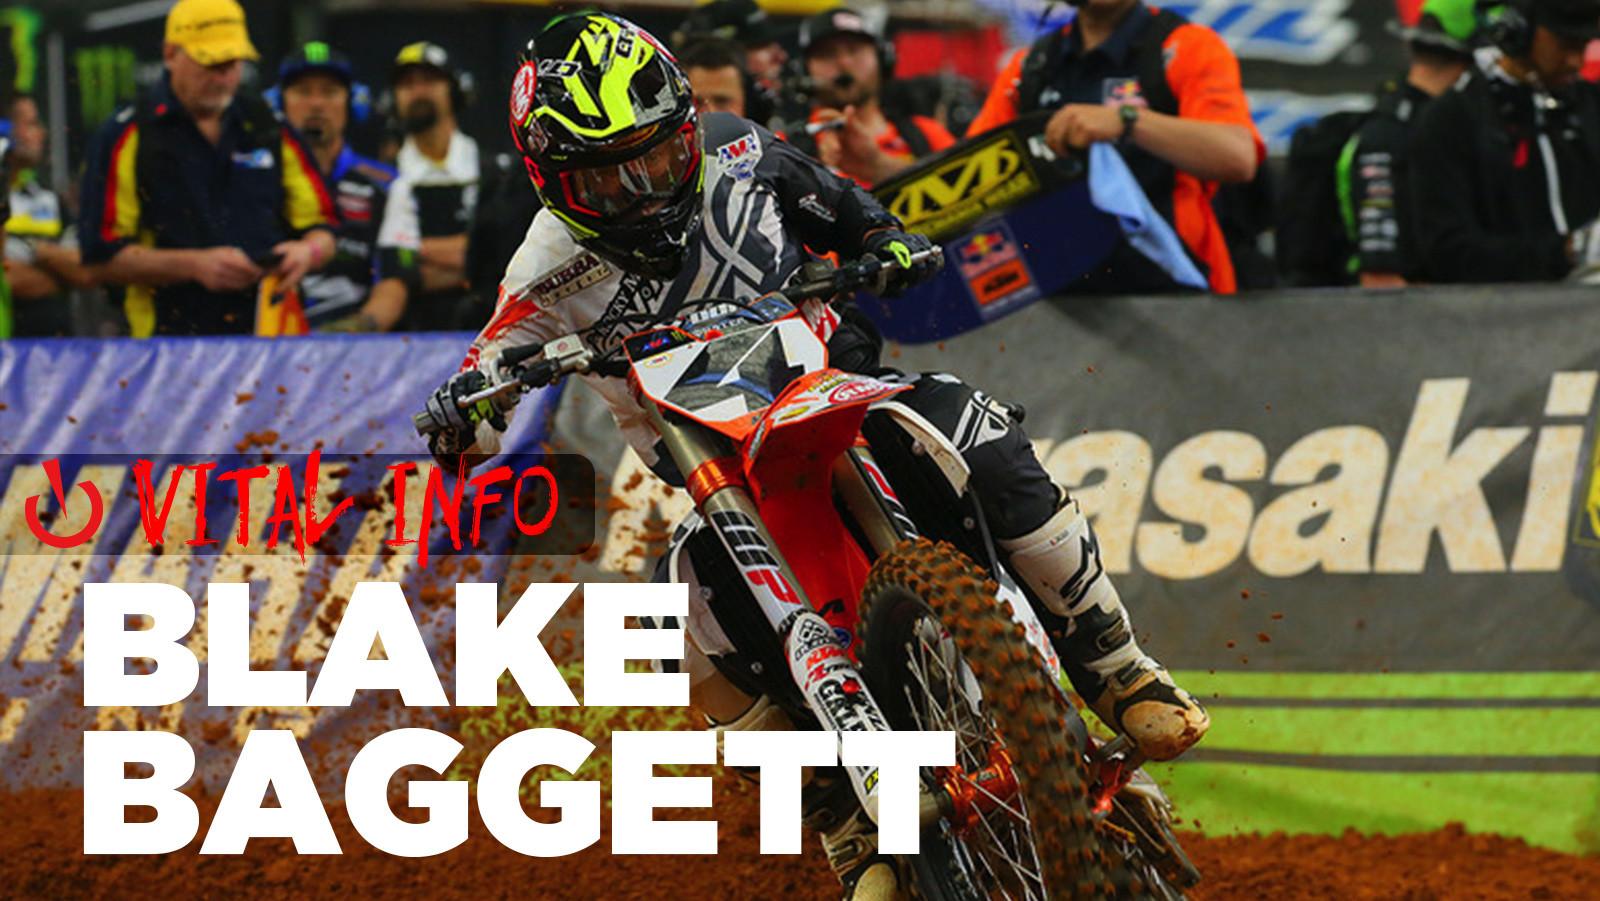 Vital Info: Blake Baggett